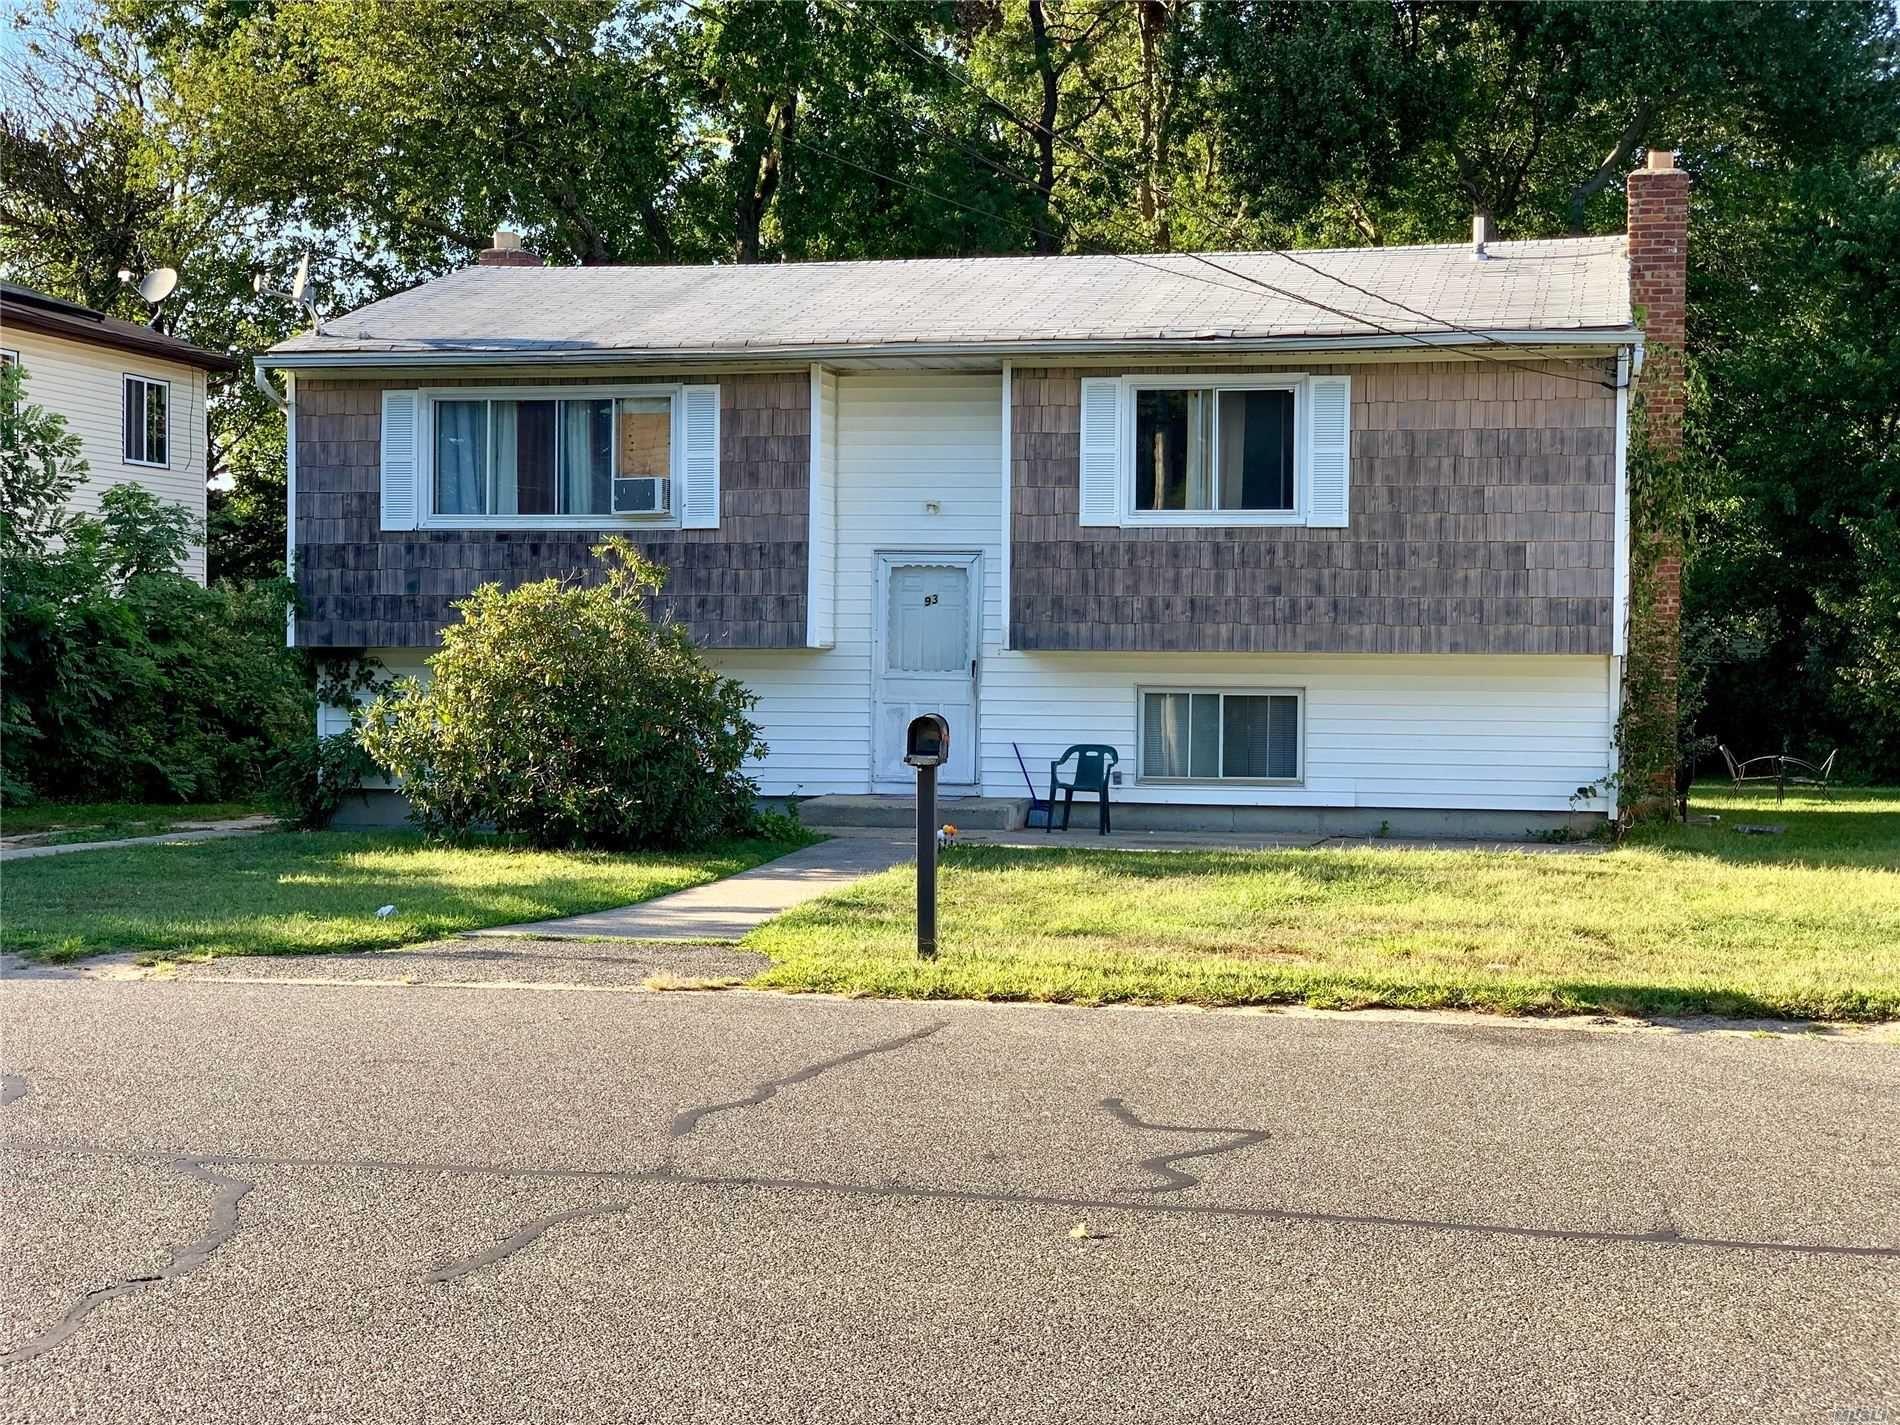 93 Garden City Avenue, Wyandanch, NY 11798 - MLS#: 3231206